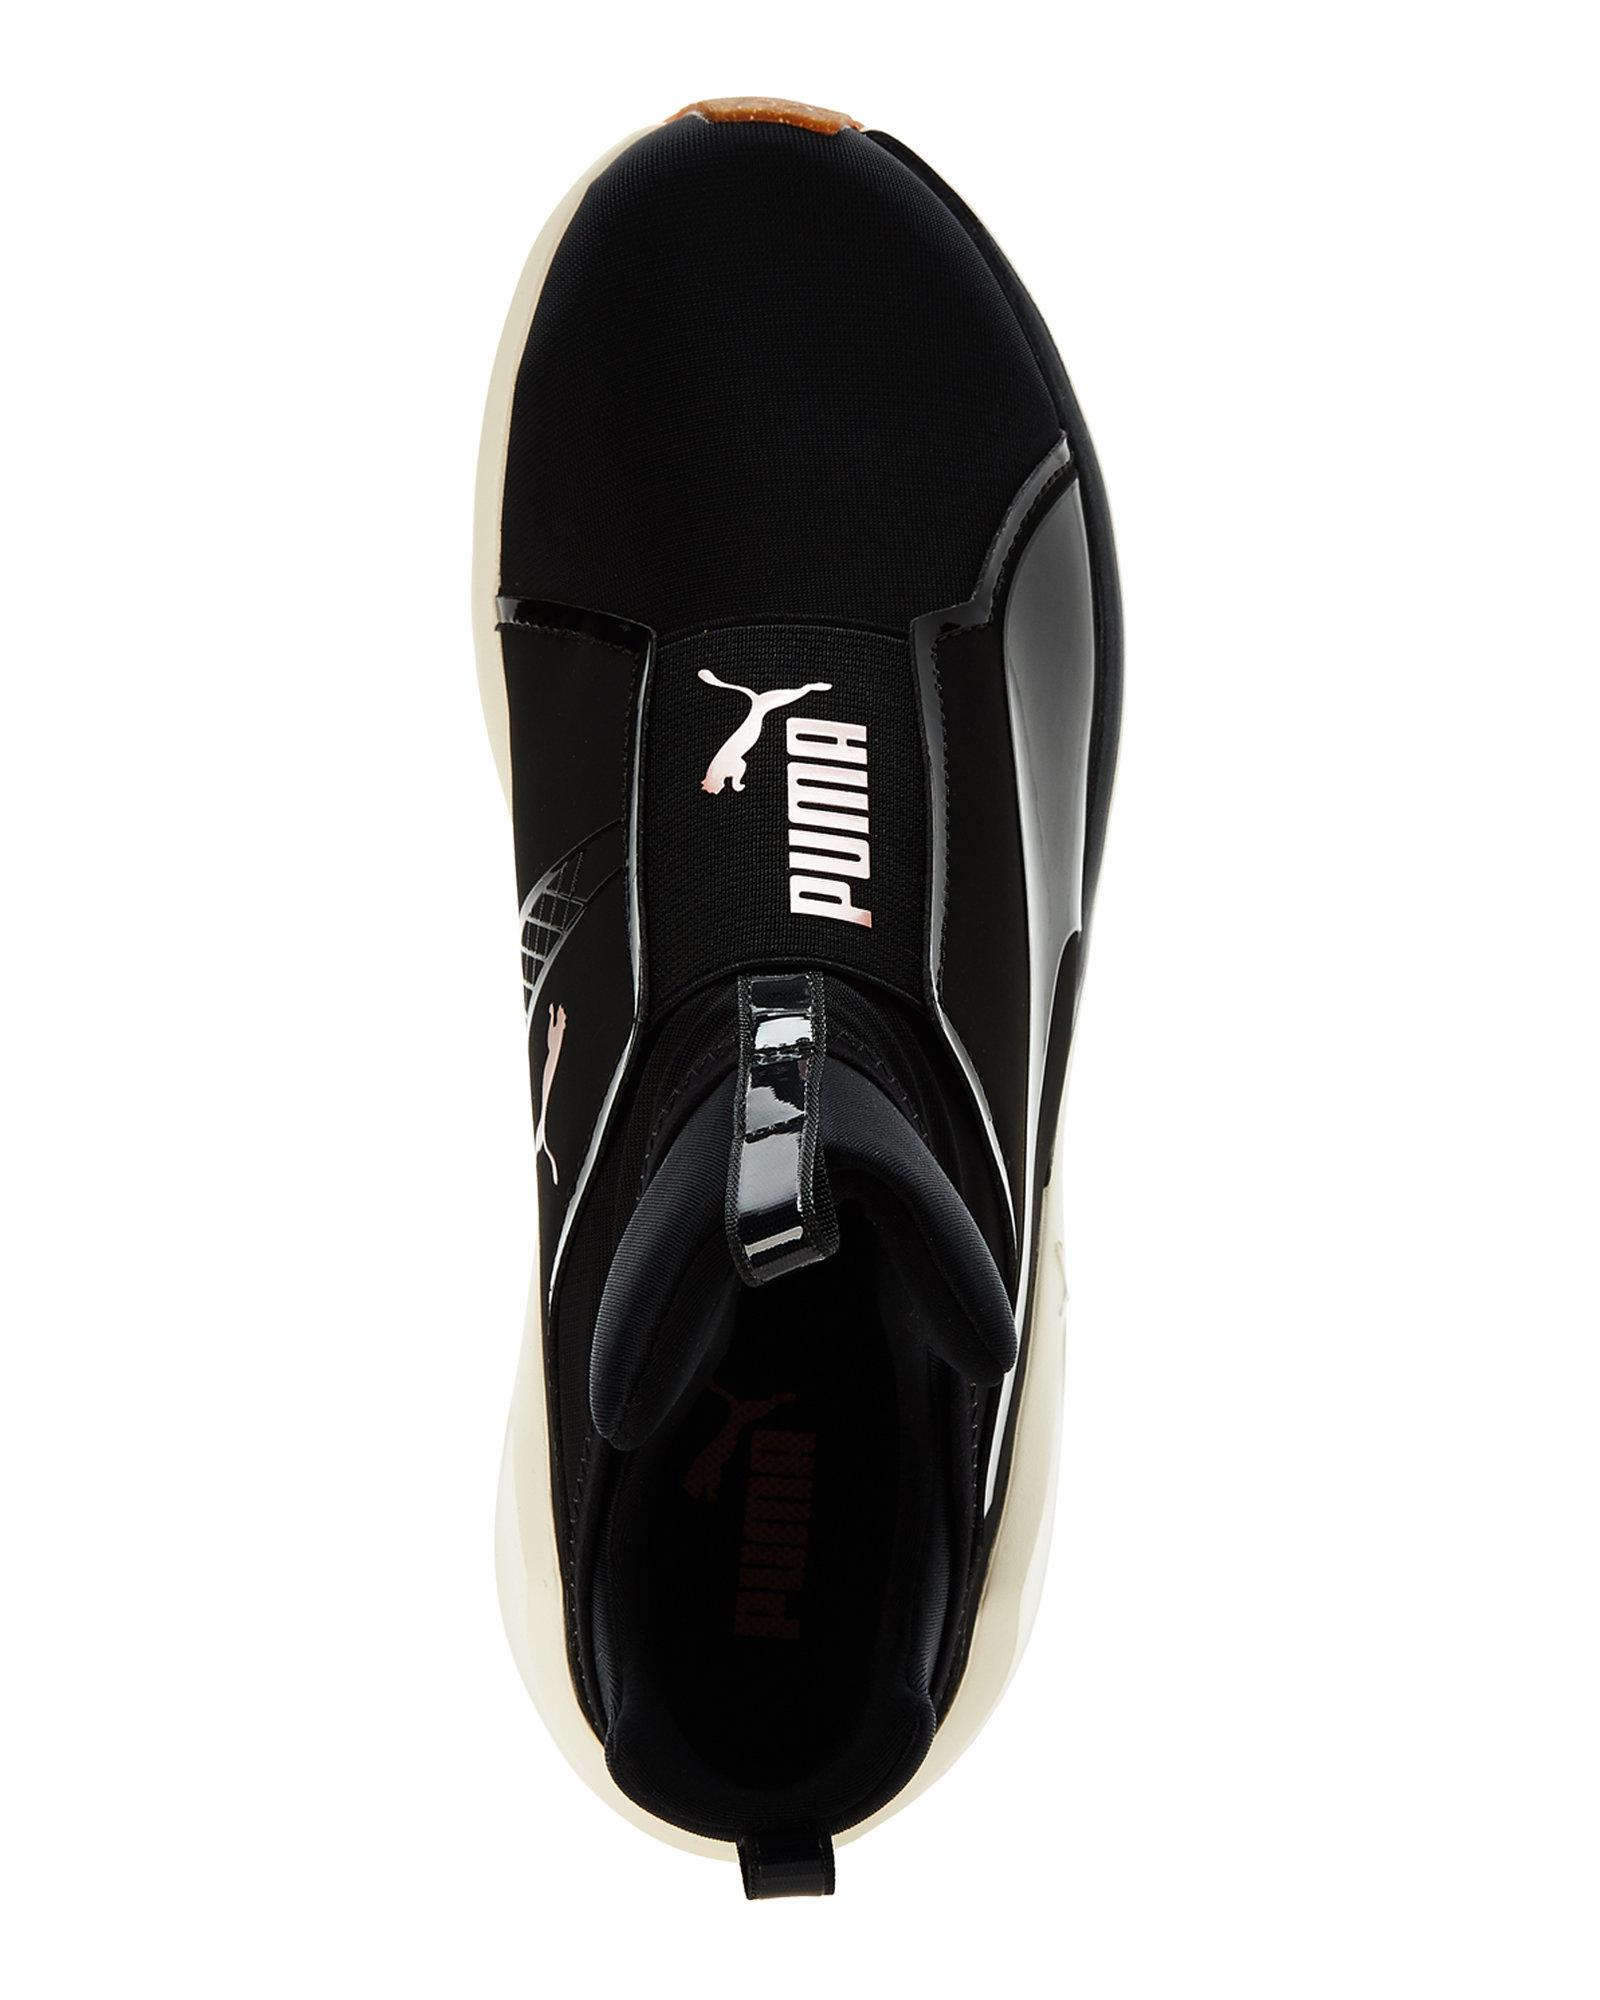 a4cd3c0ed66c98 Lyst - PUMA Black   Rose Gold Fierce Vr Training Sneakers in Black